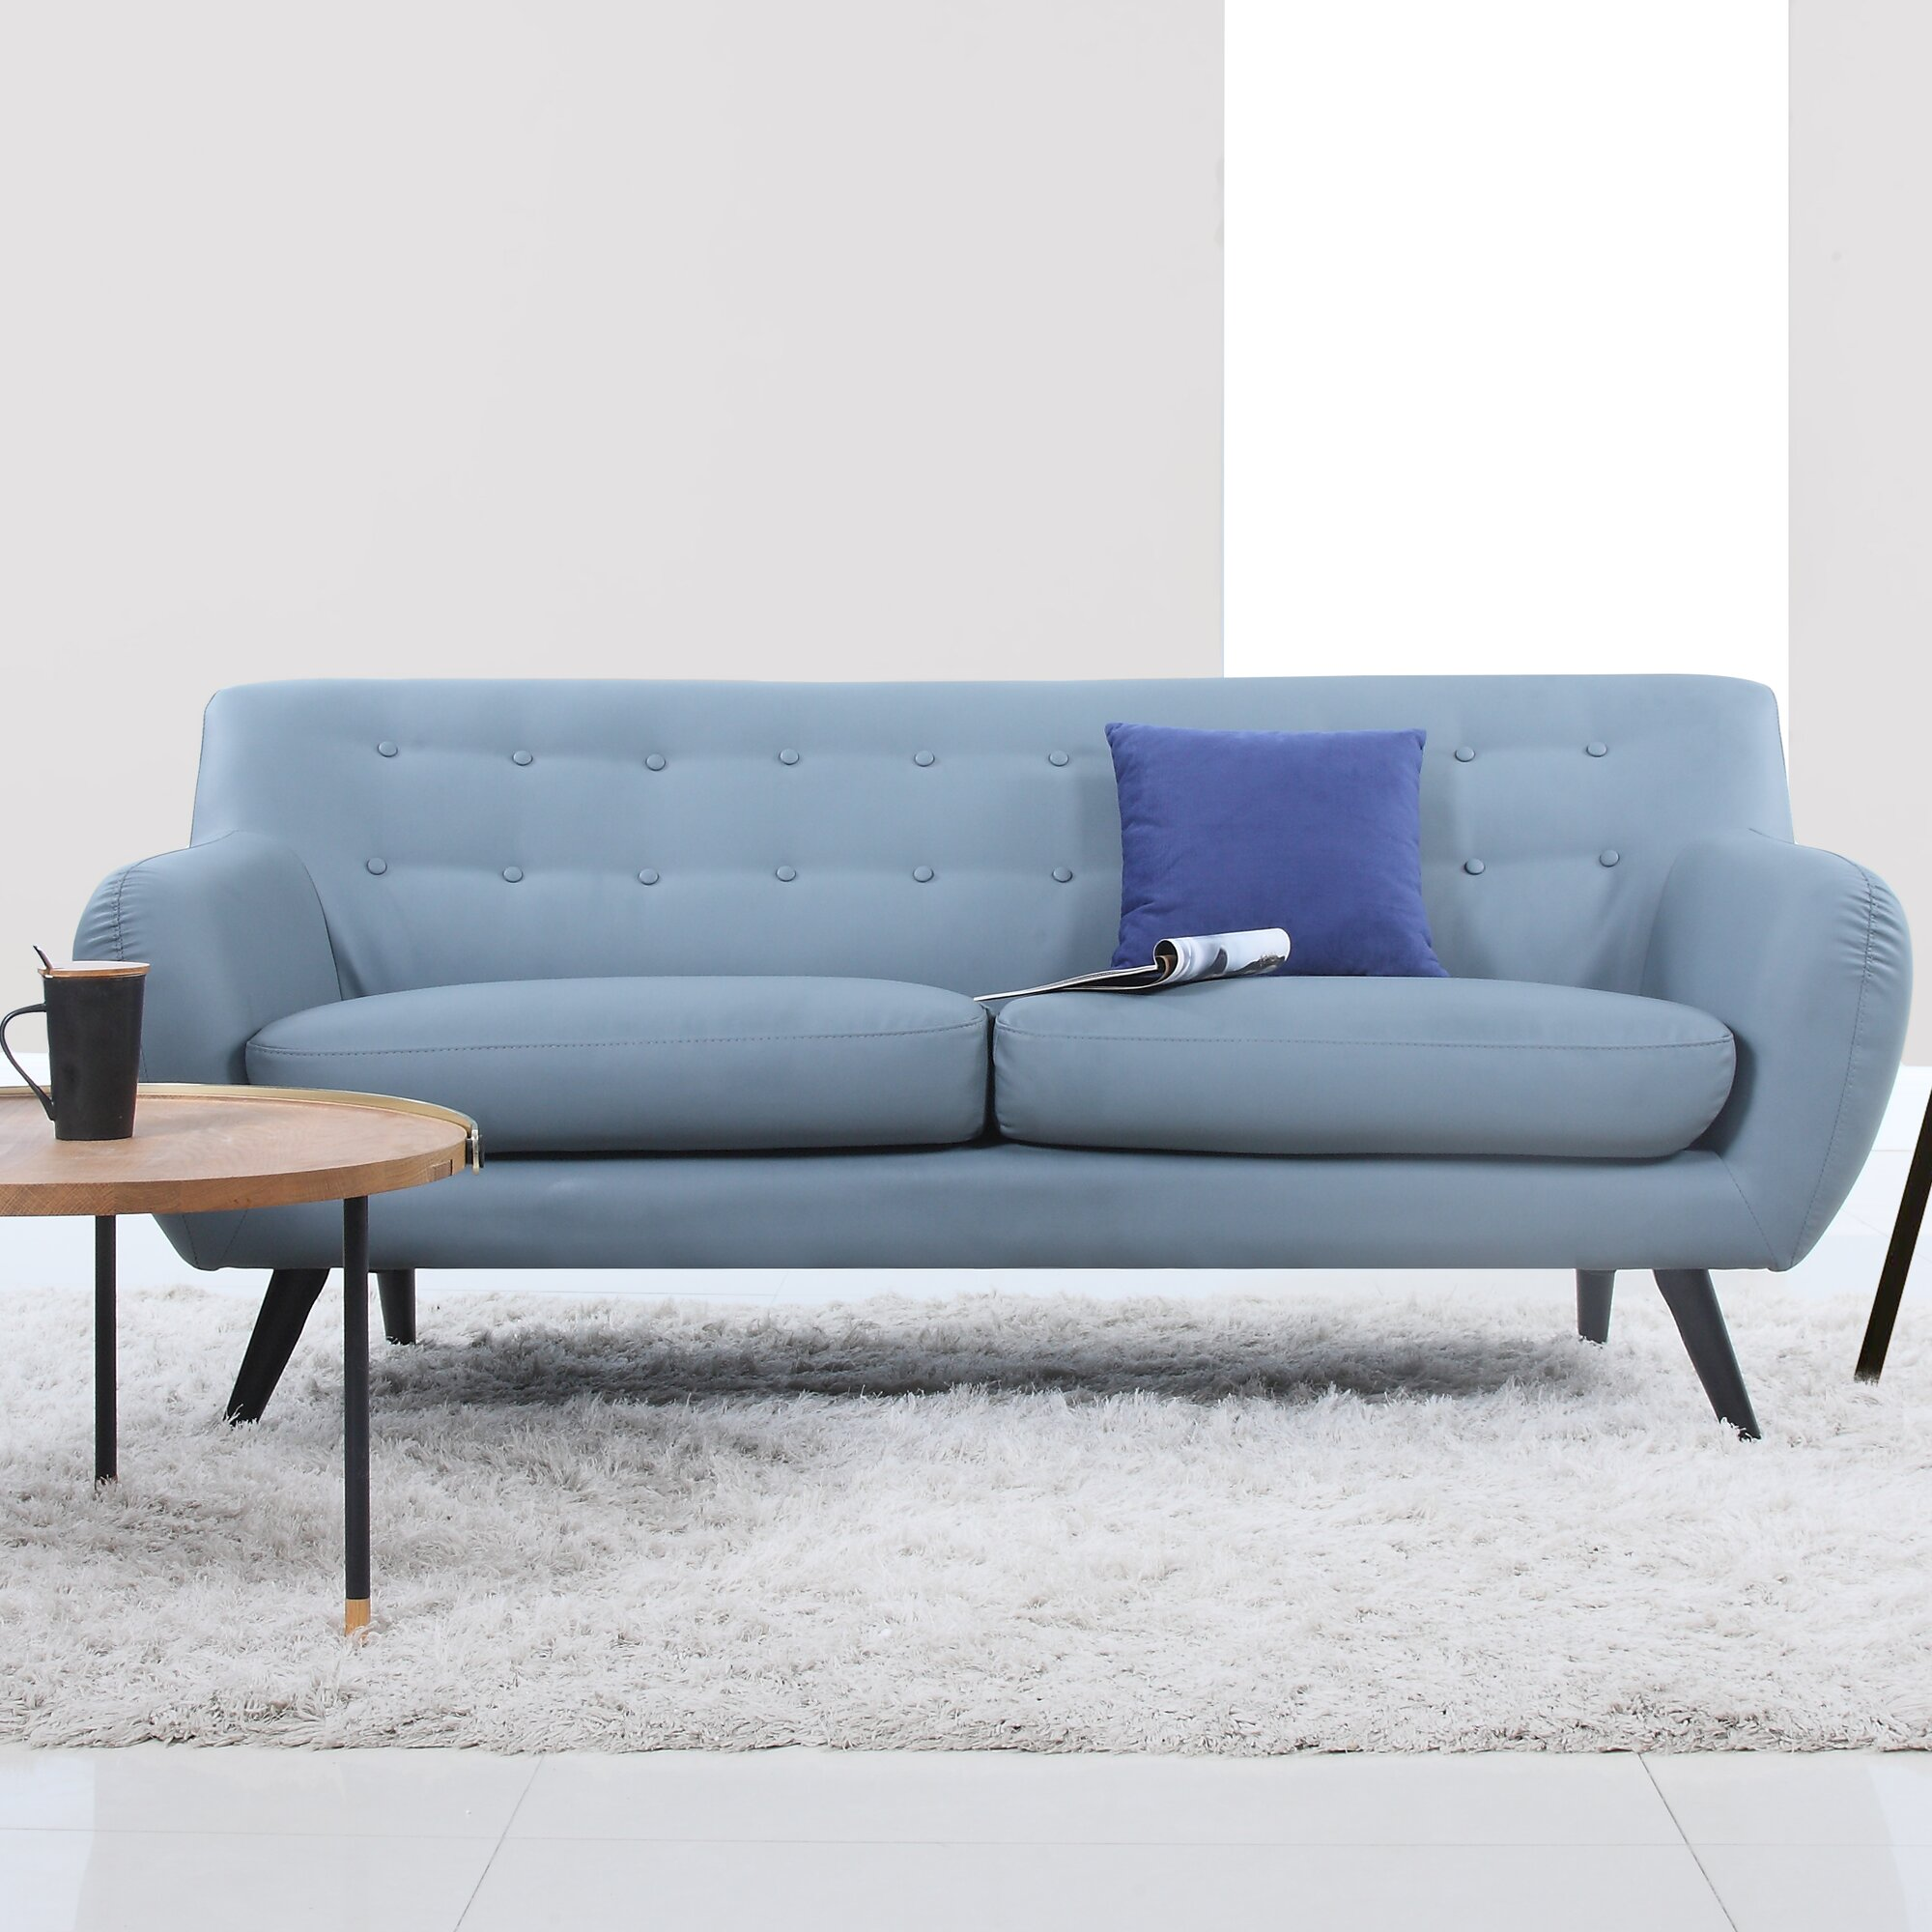 Goodale Mid Century Modern Sofa: Madison Home USA Mid Century Modern Tufted Sofa & Reviews